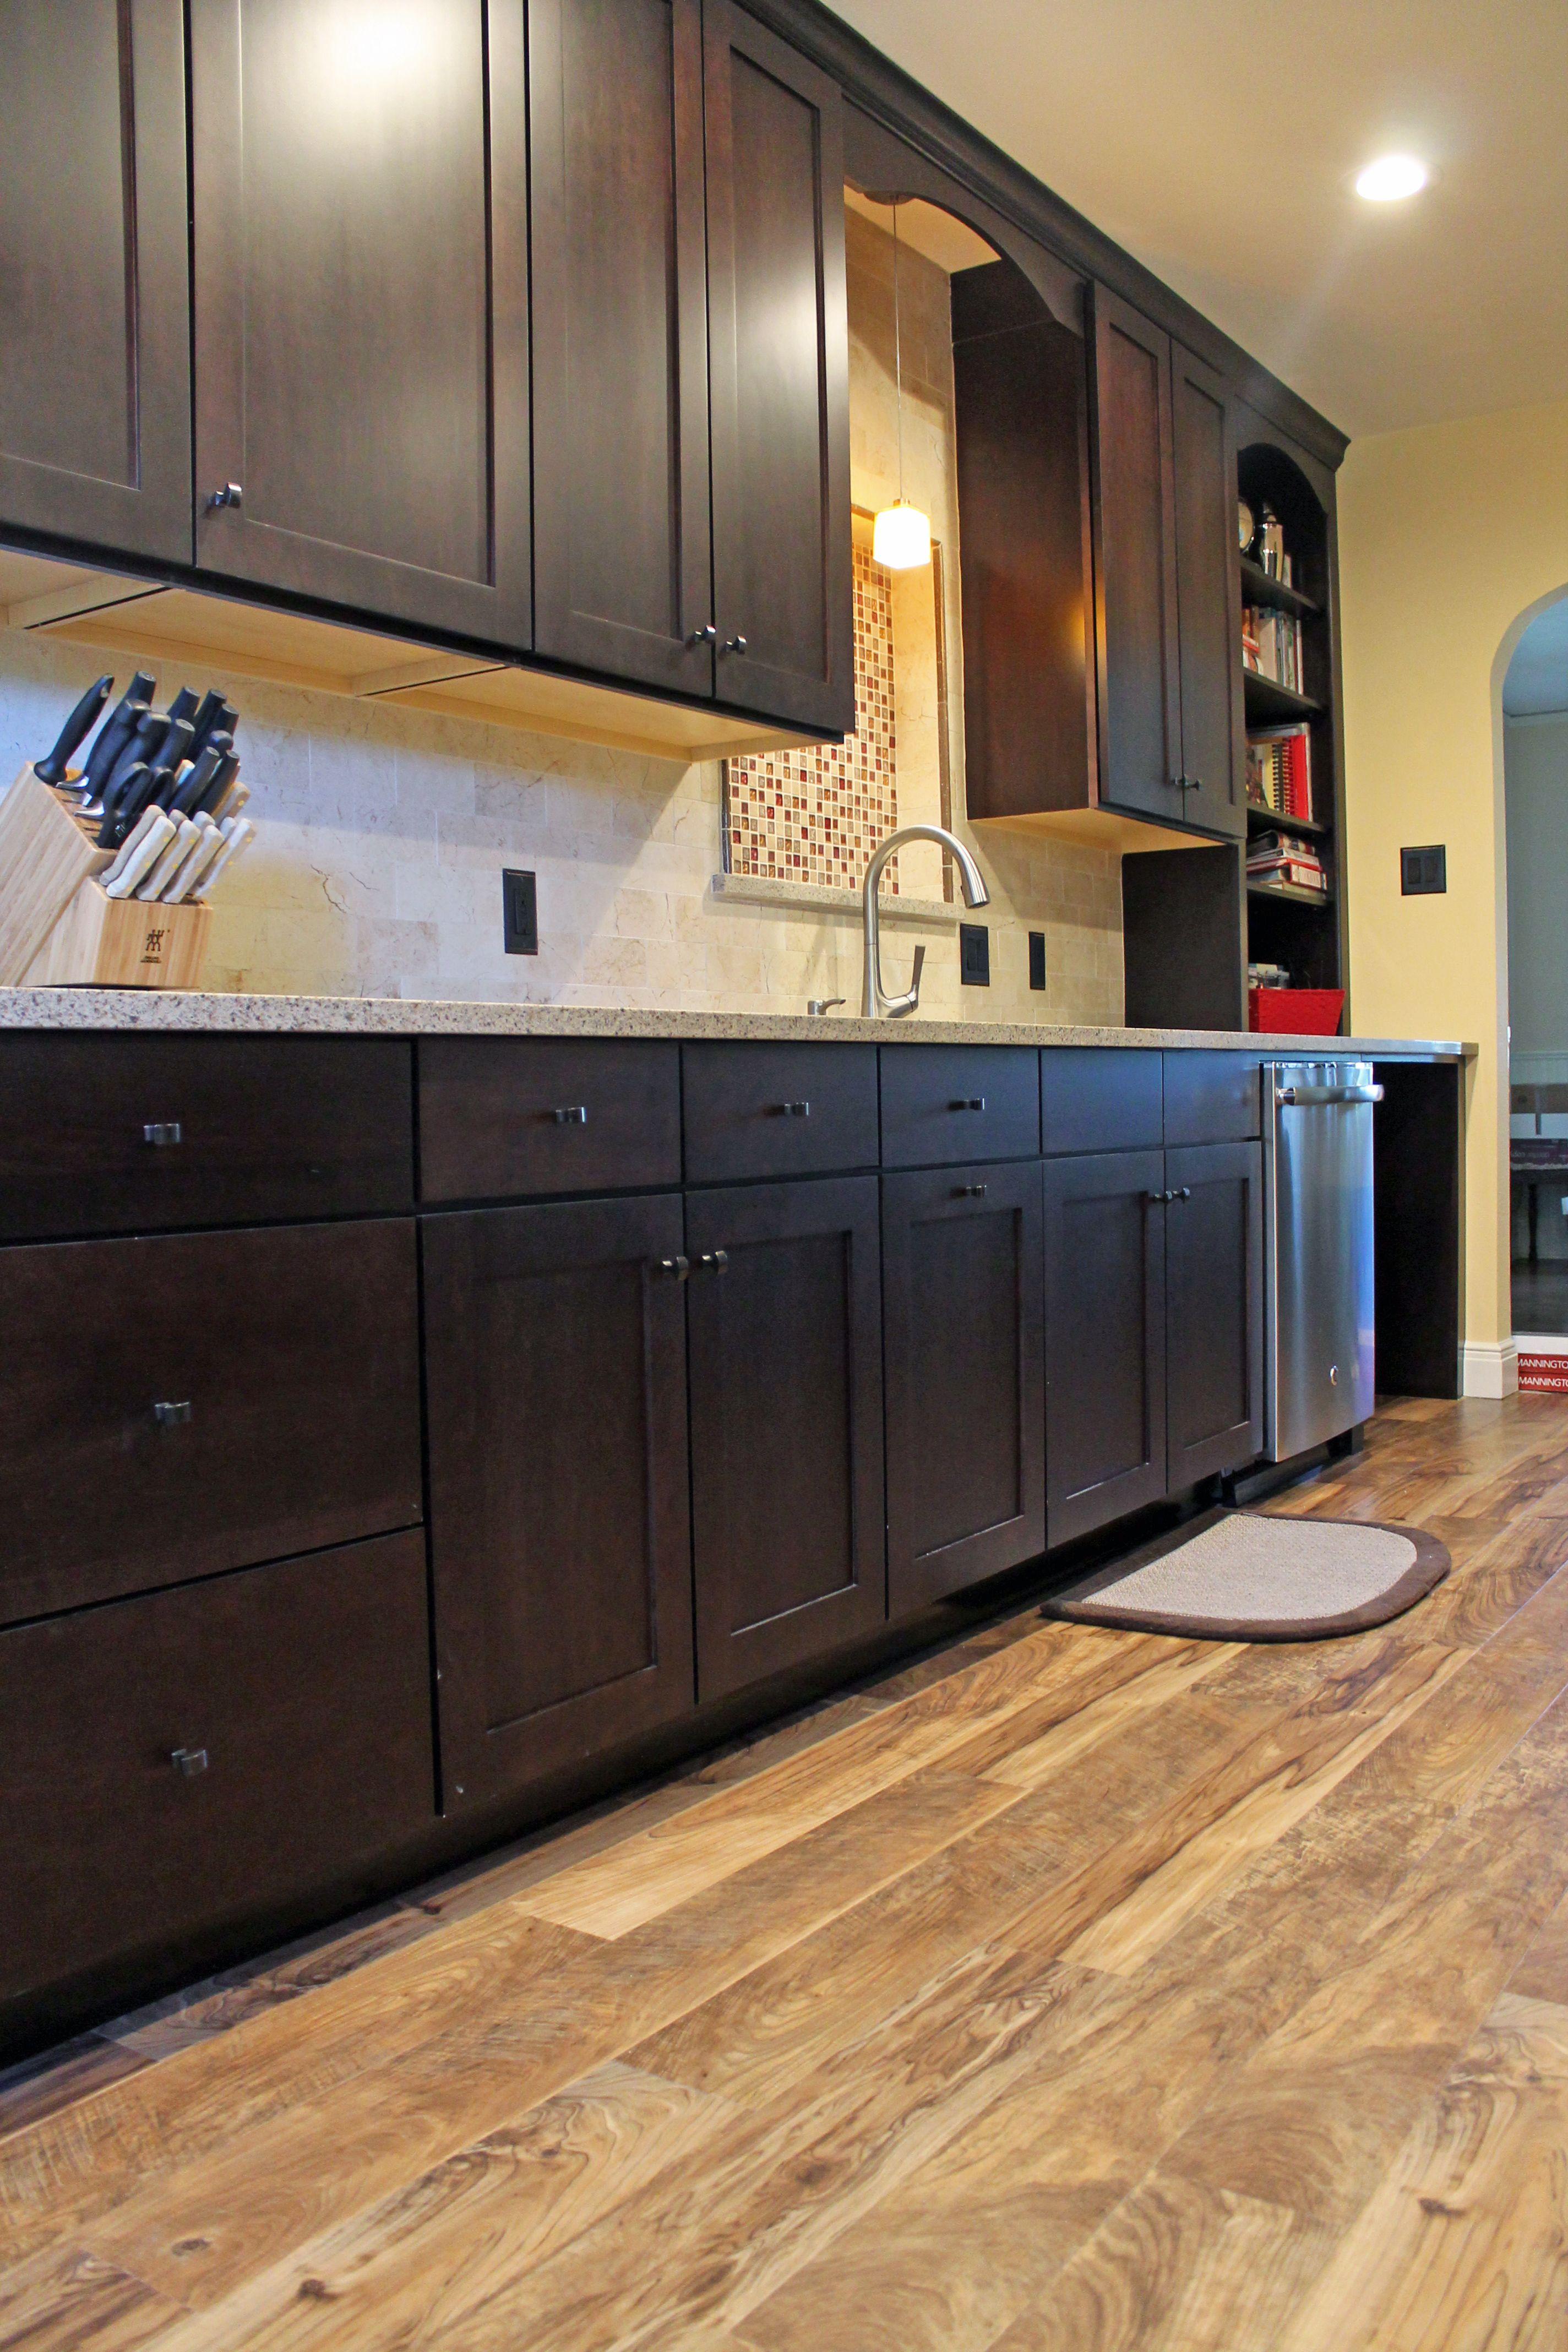 traditional kitchen design maple wellborn cabinets and vinyl plank floors ideas vinyl on kitchen remodel vinyl flooring id=45538